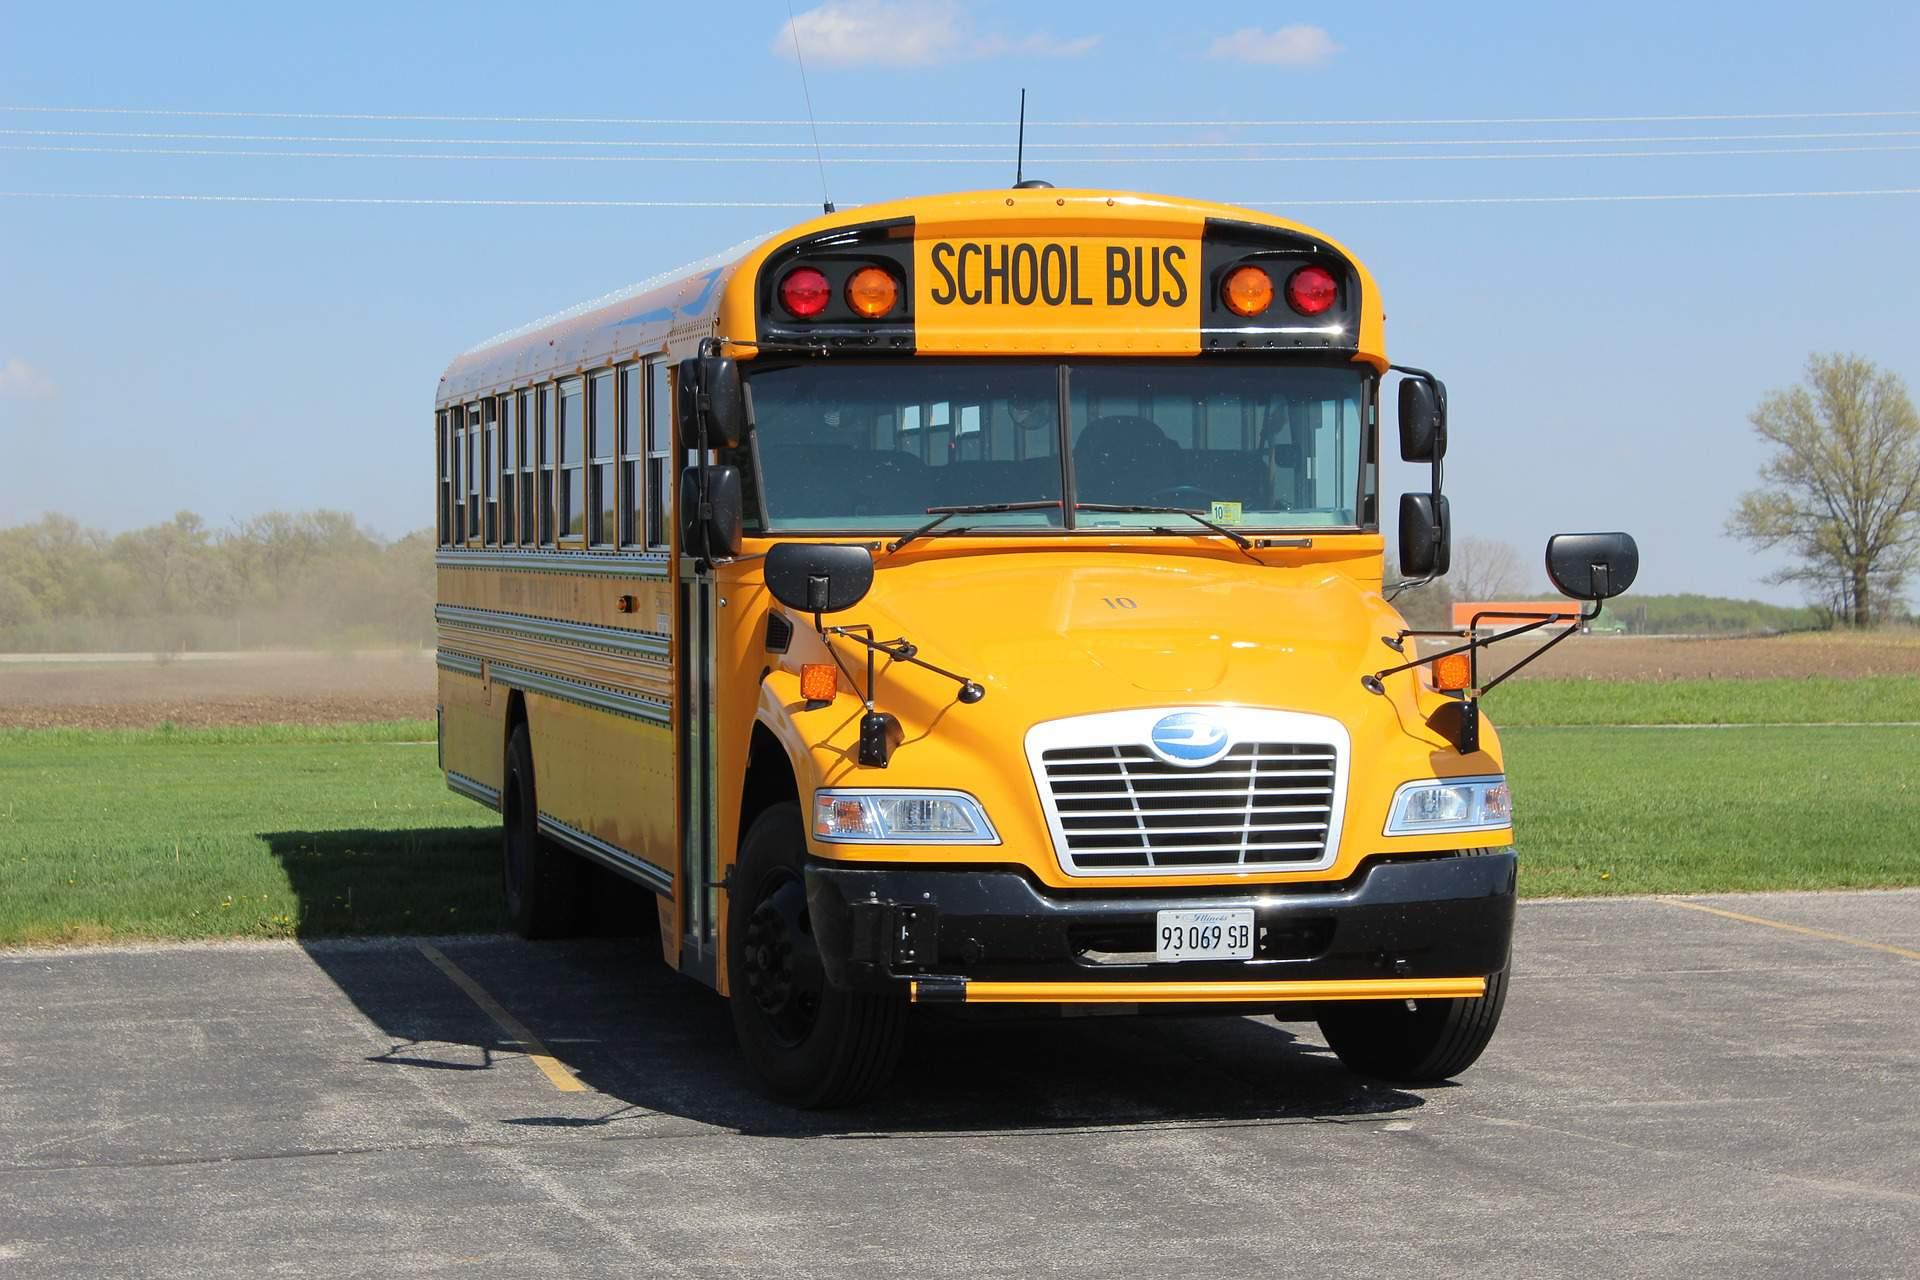 school bus, bus, transport